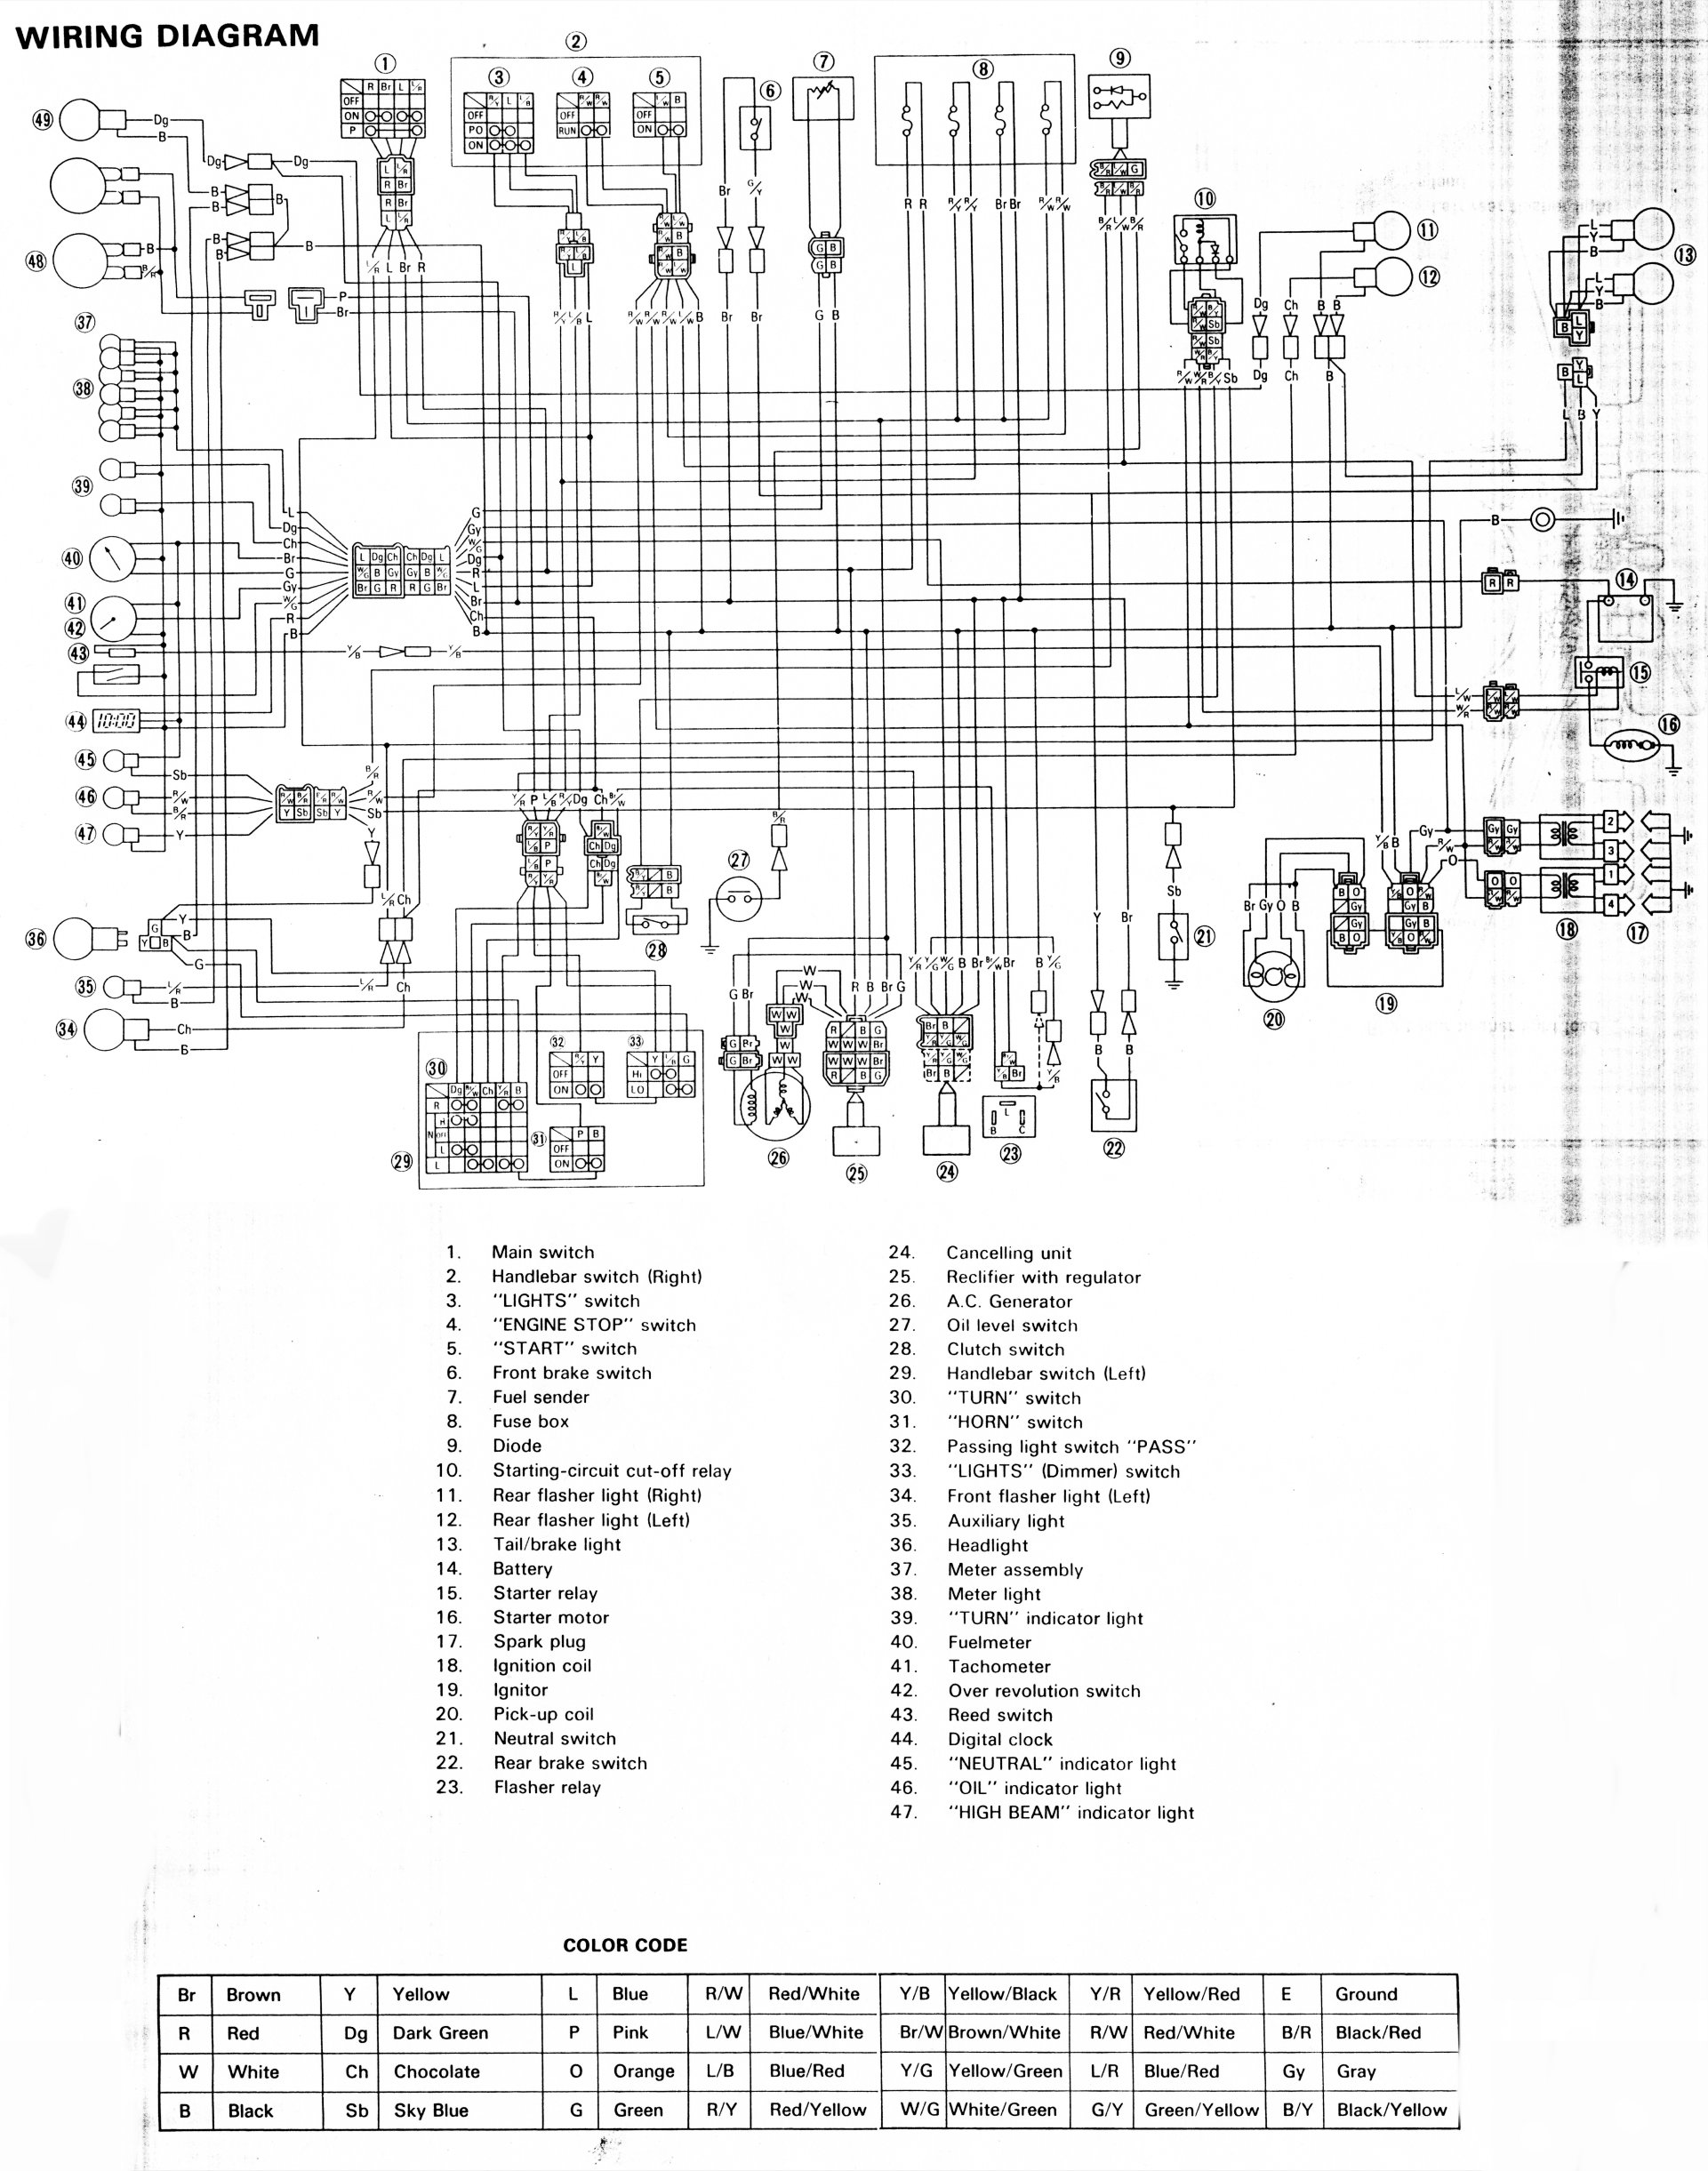 vw golf 83 wiring diagram manual